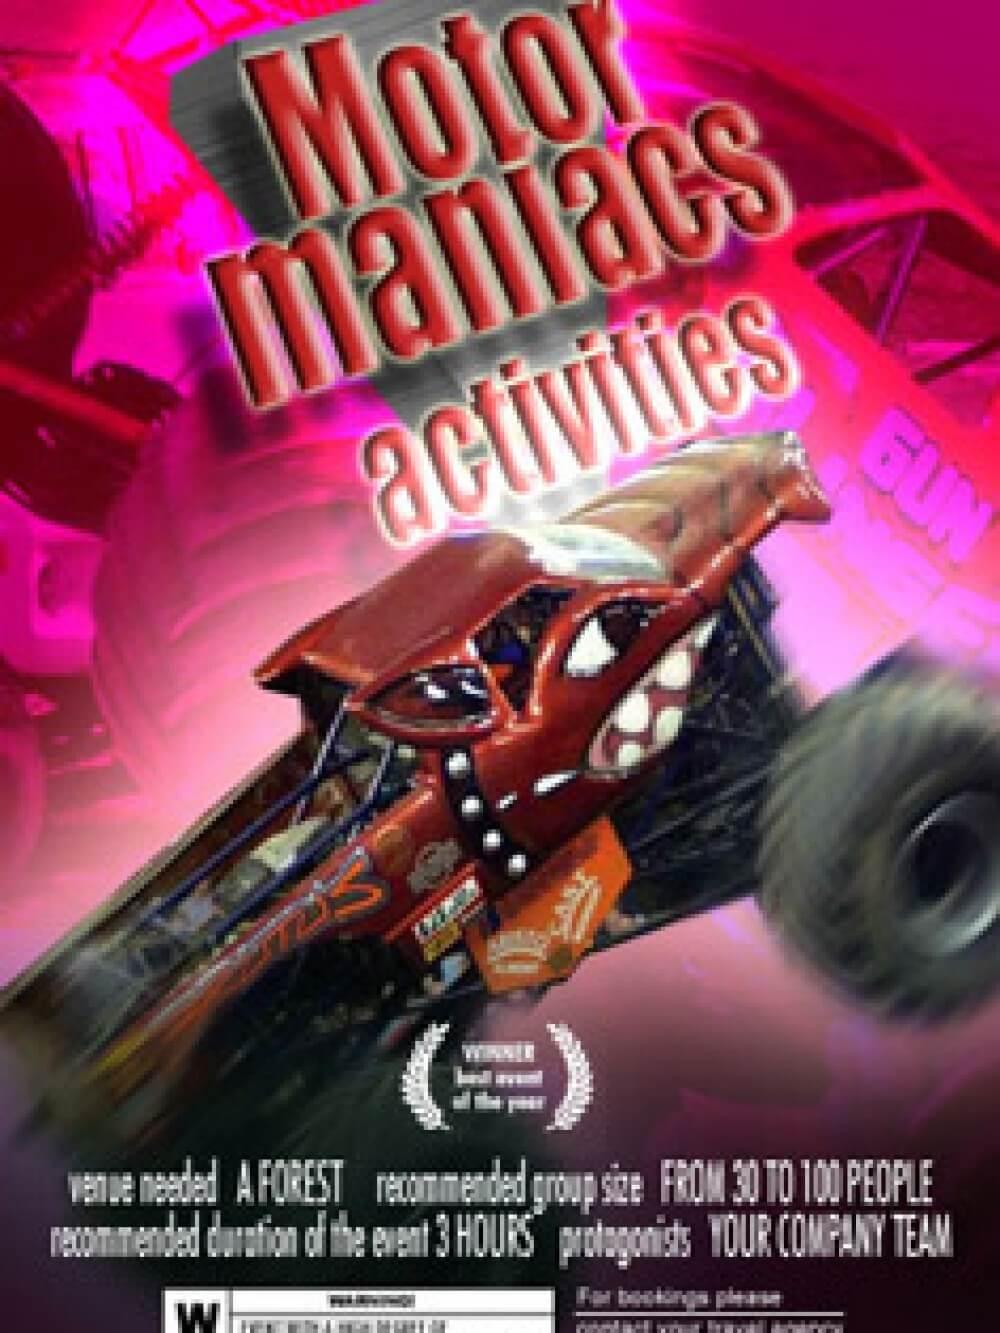 motor_maniacs_activities_vertical_web